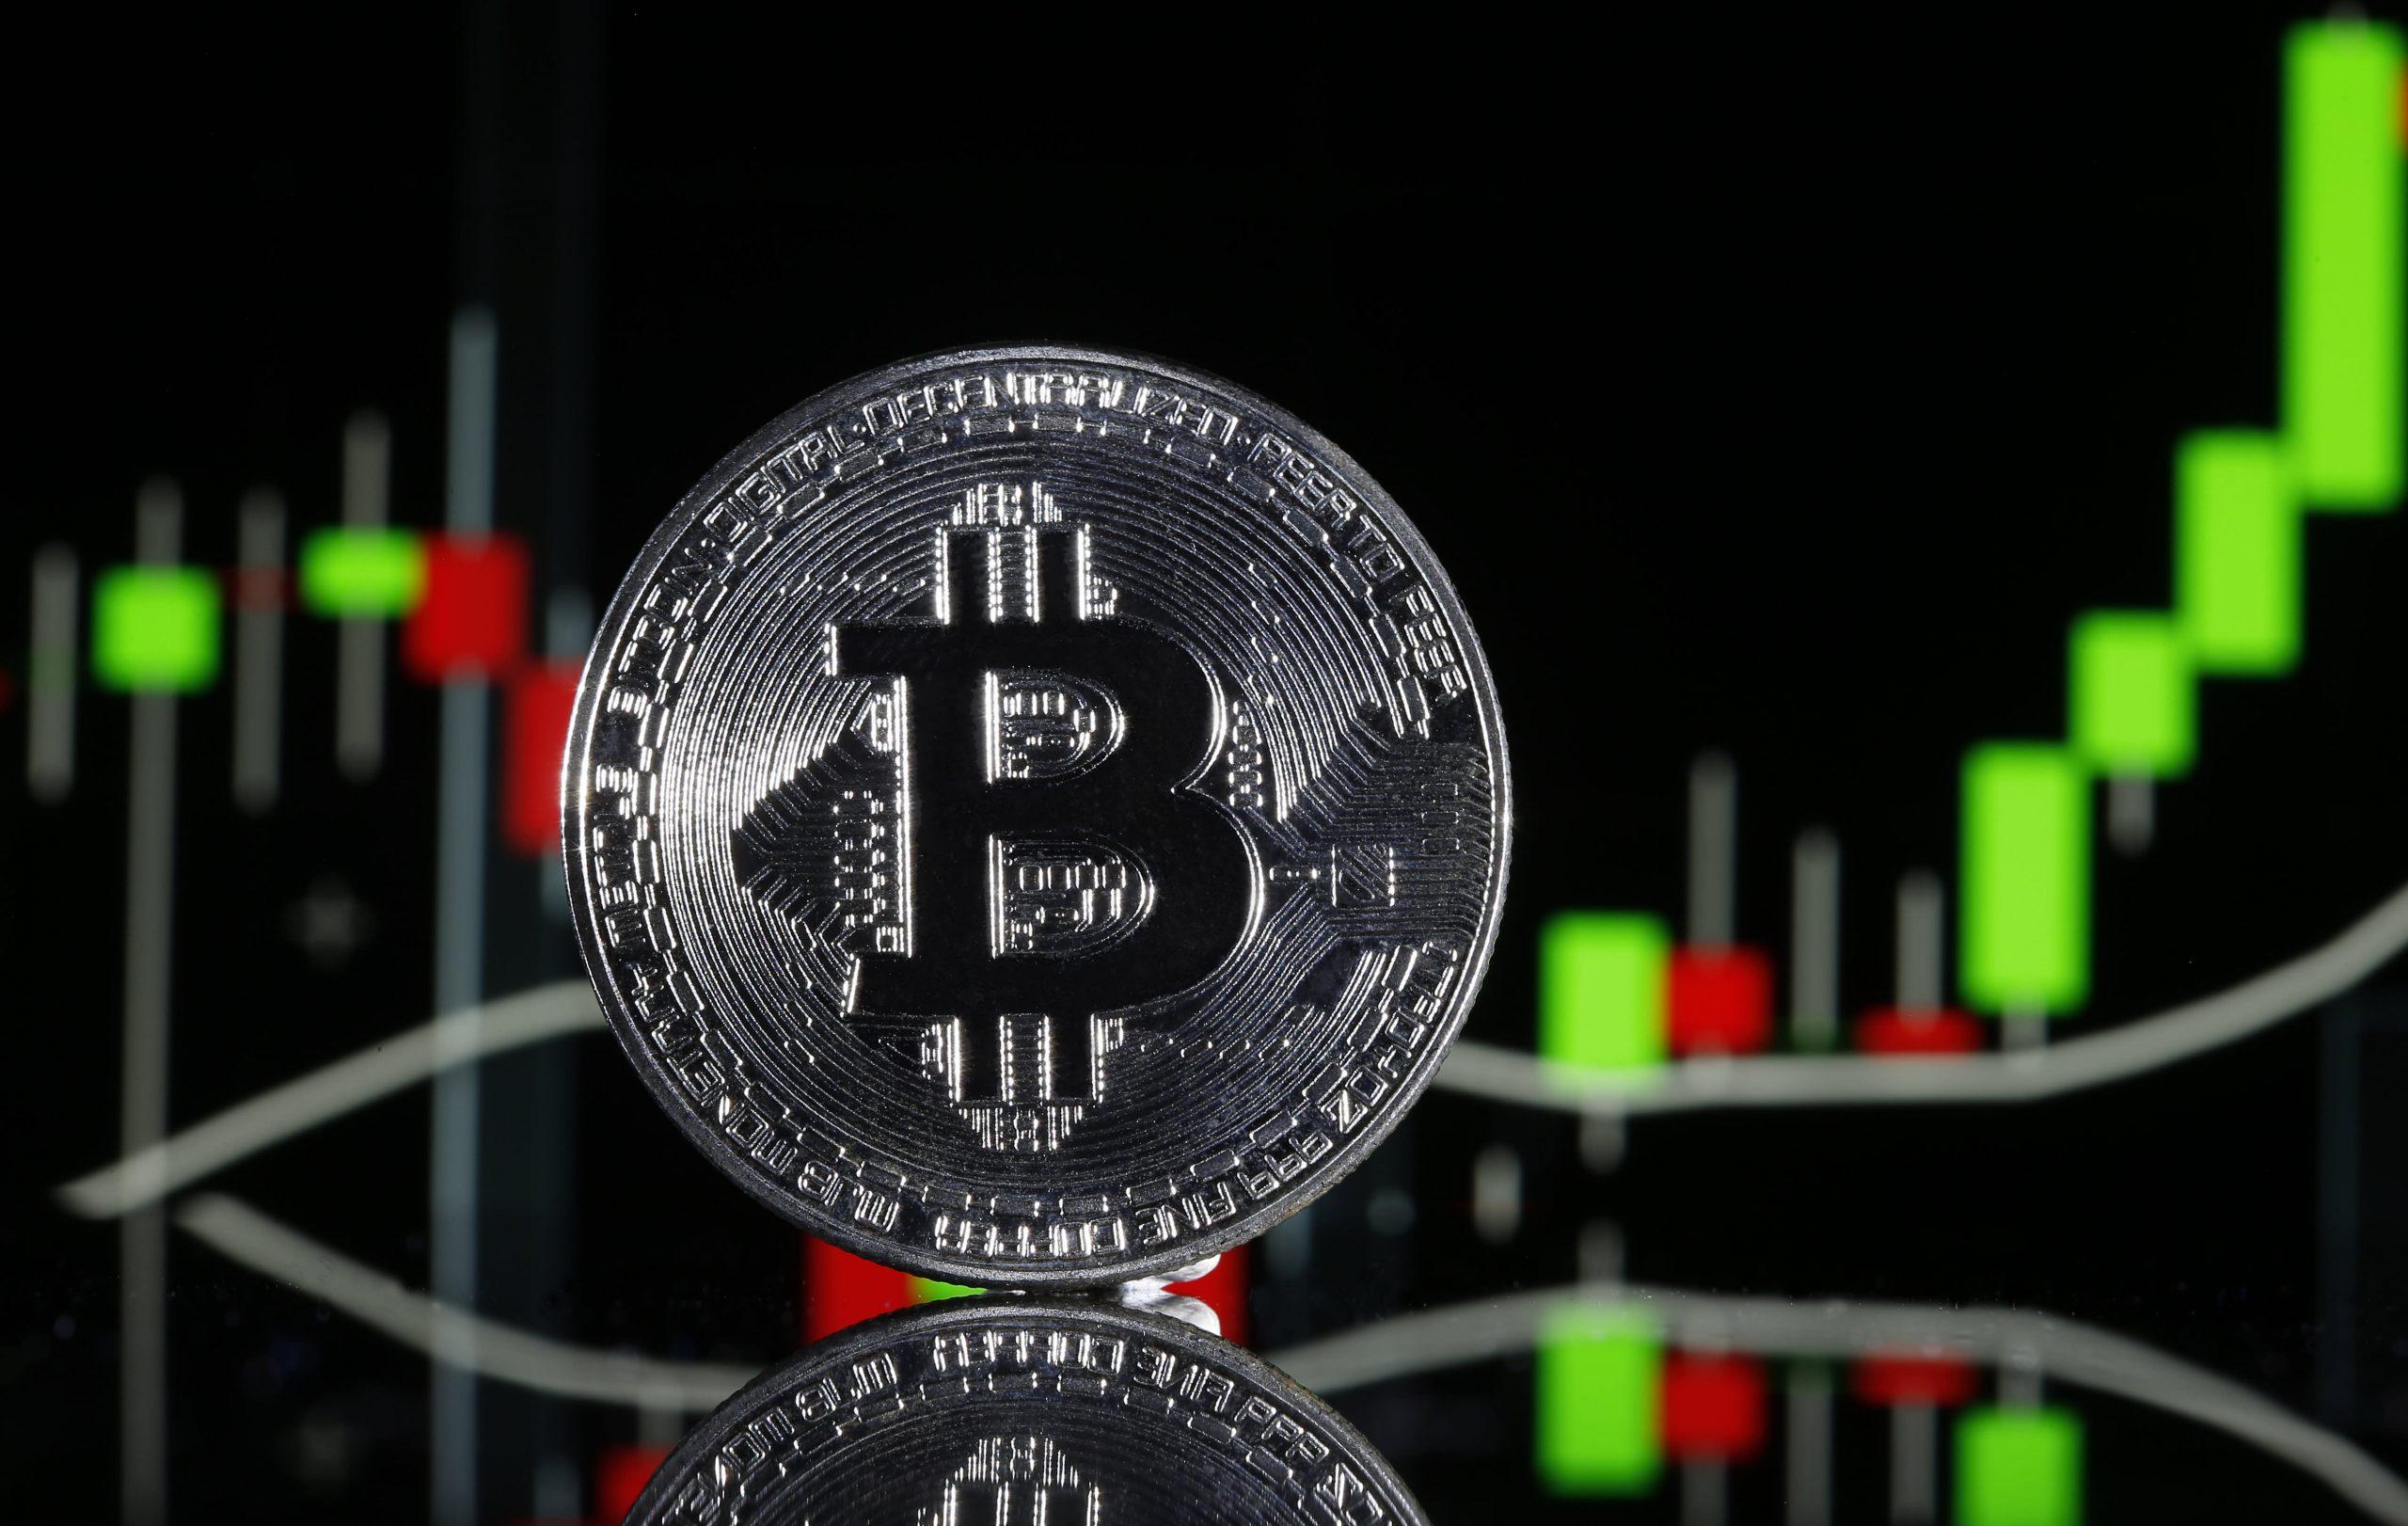 Bitcoin (BTC) price jumps after El Salvador adopts it as legal tender